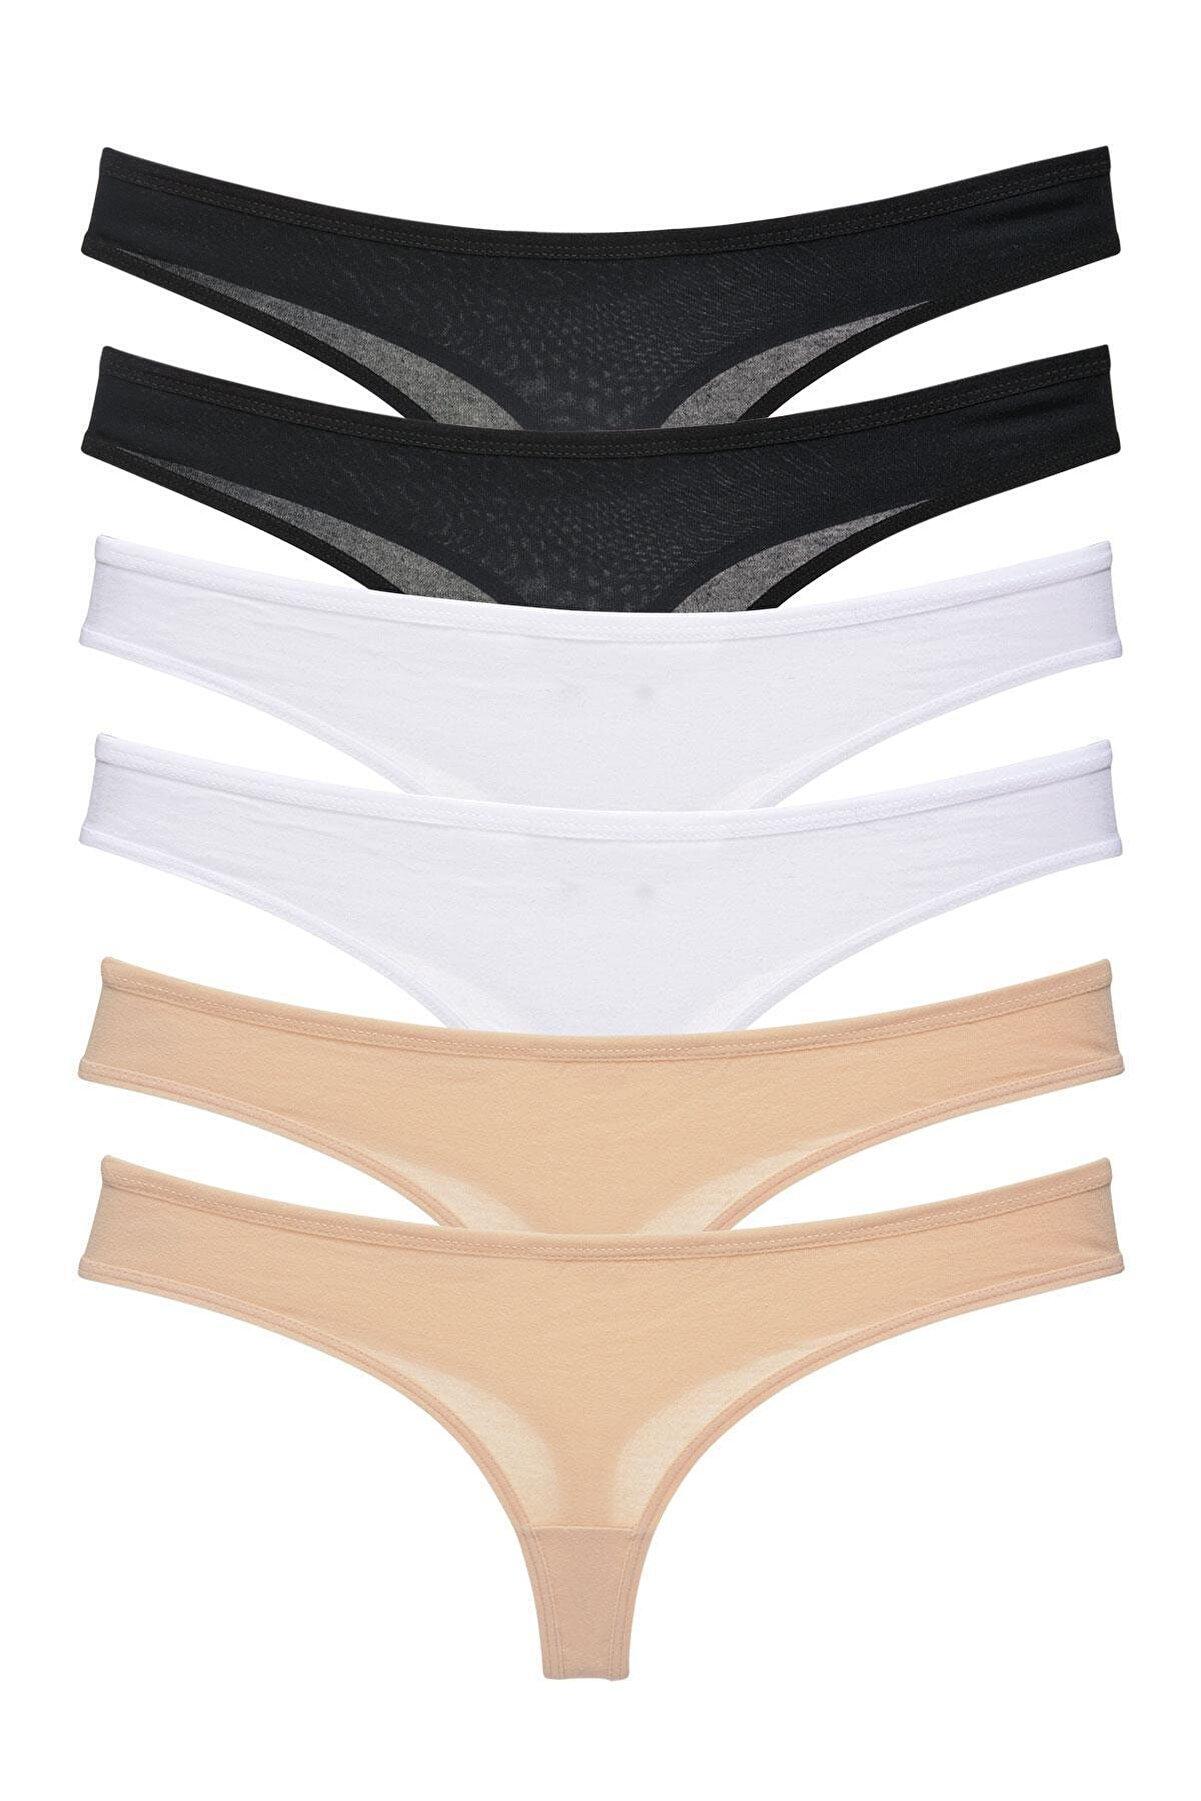 LadyMelex Kadın Siyah Beyaz Ten 6'lı Paket Tanga